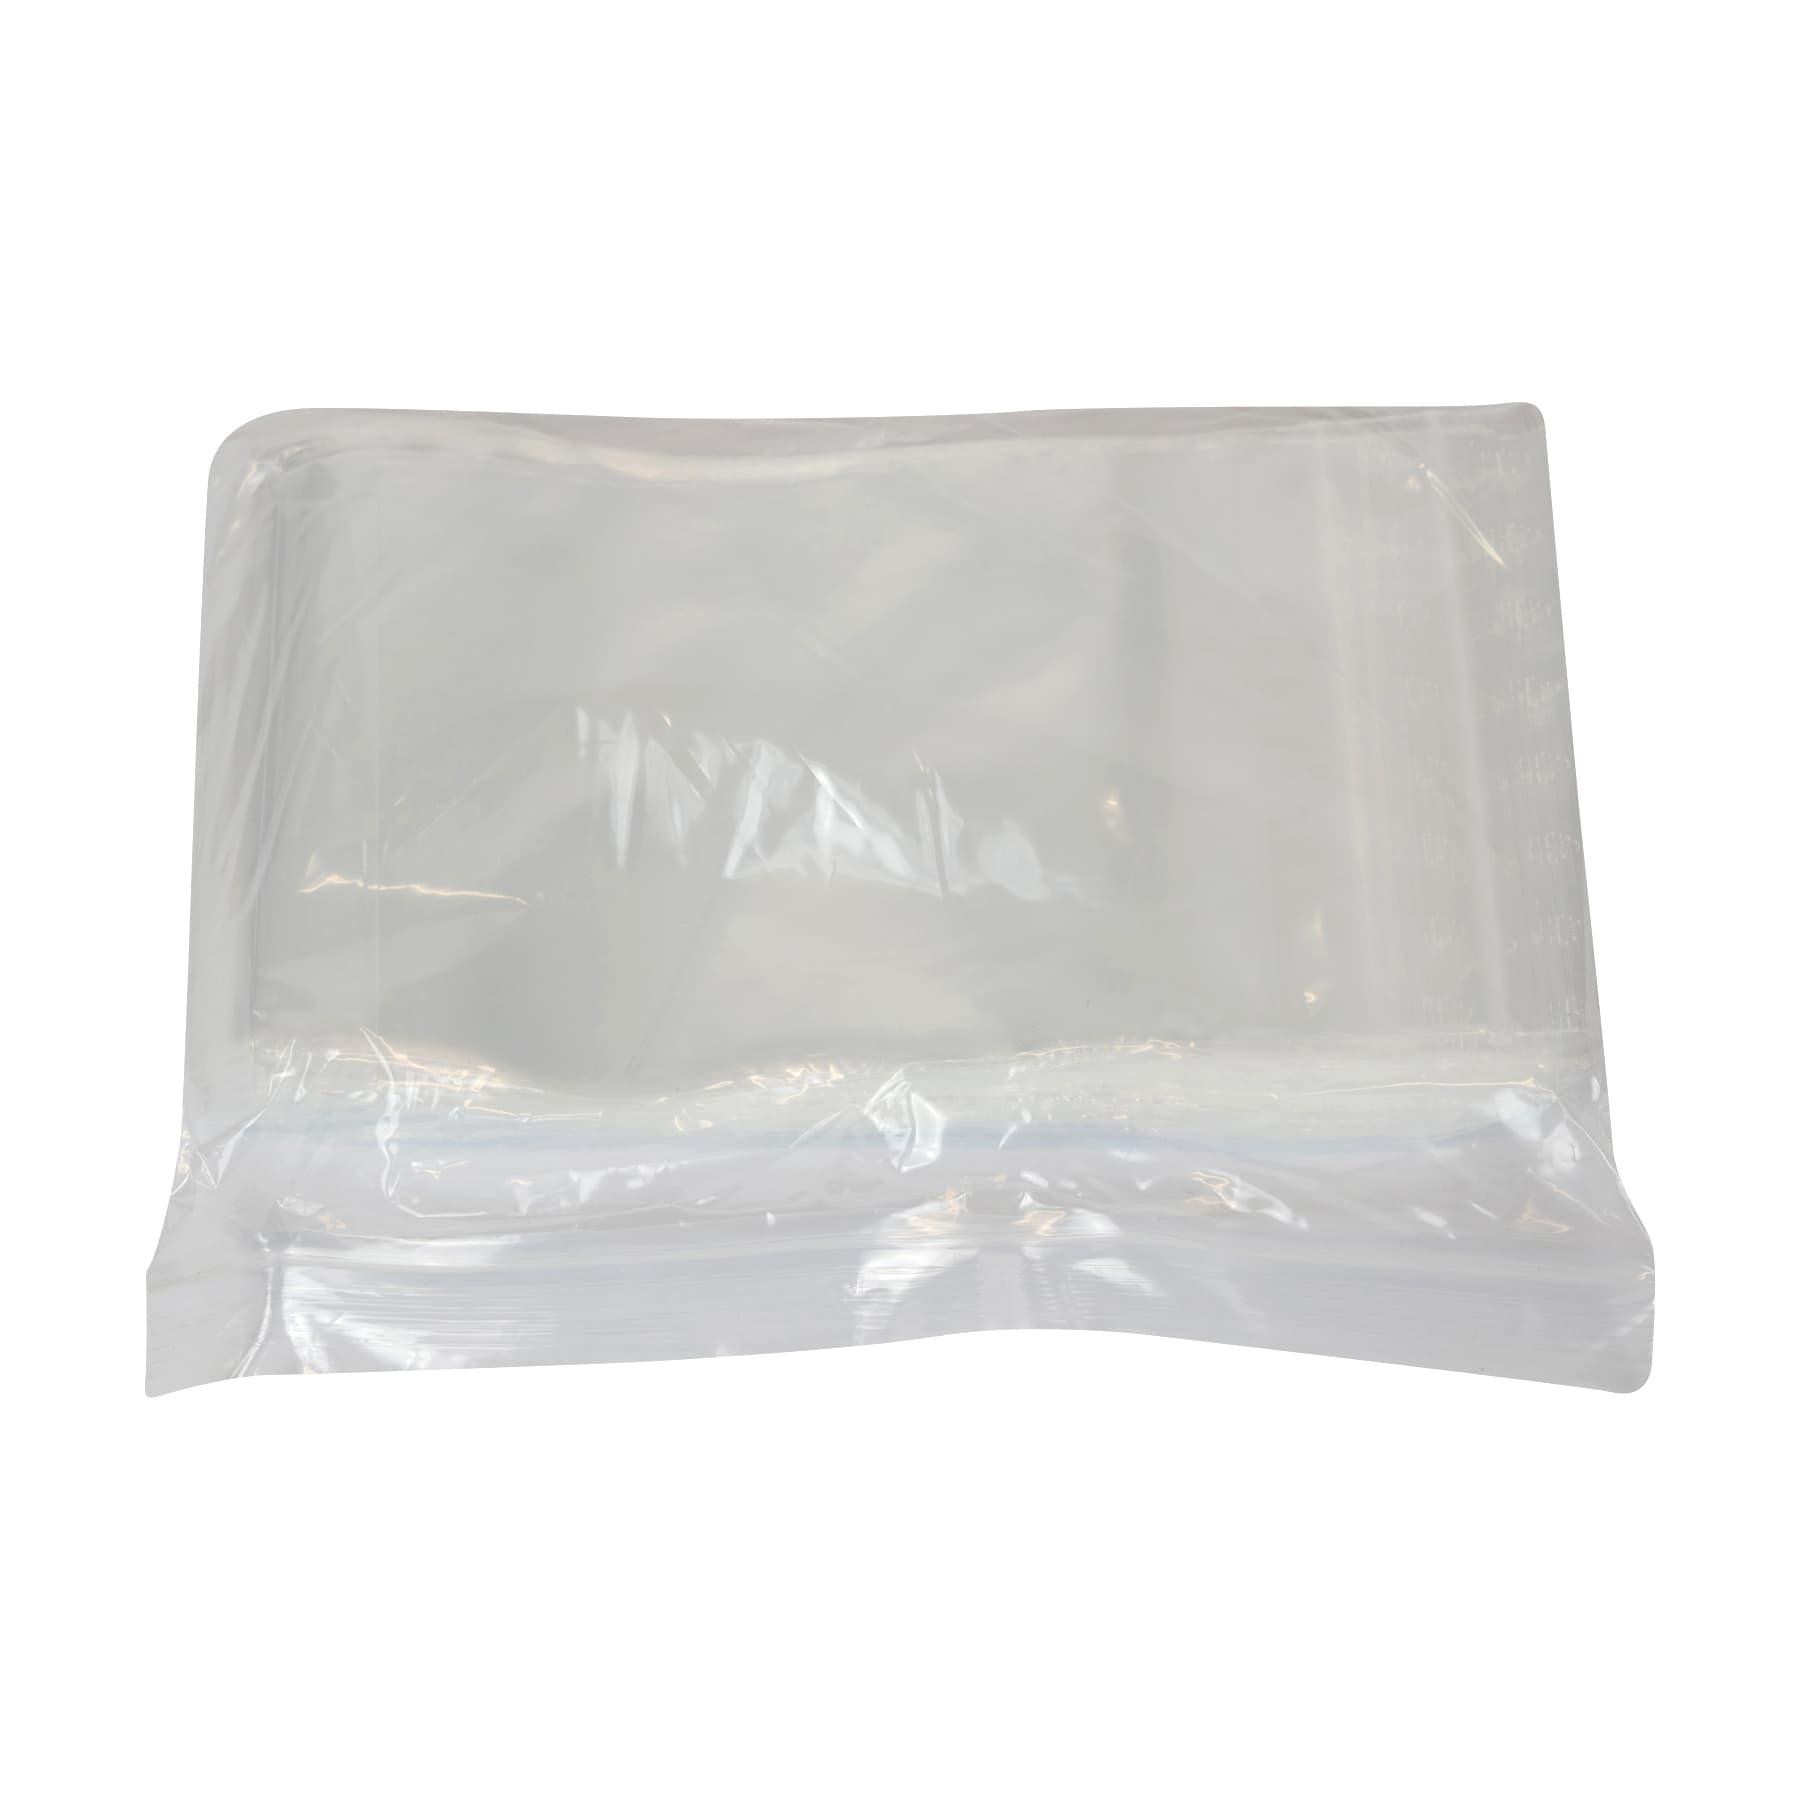 Quicksafe Beutel 100 x 150 mm   100 St.